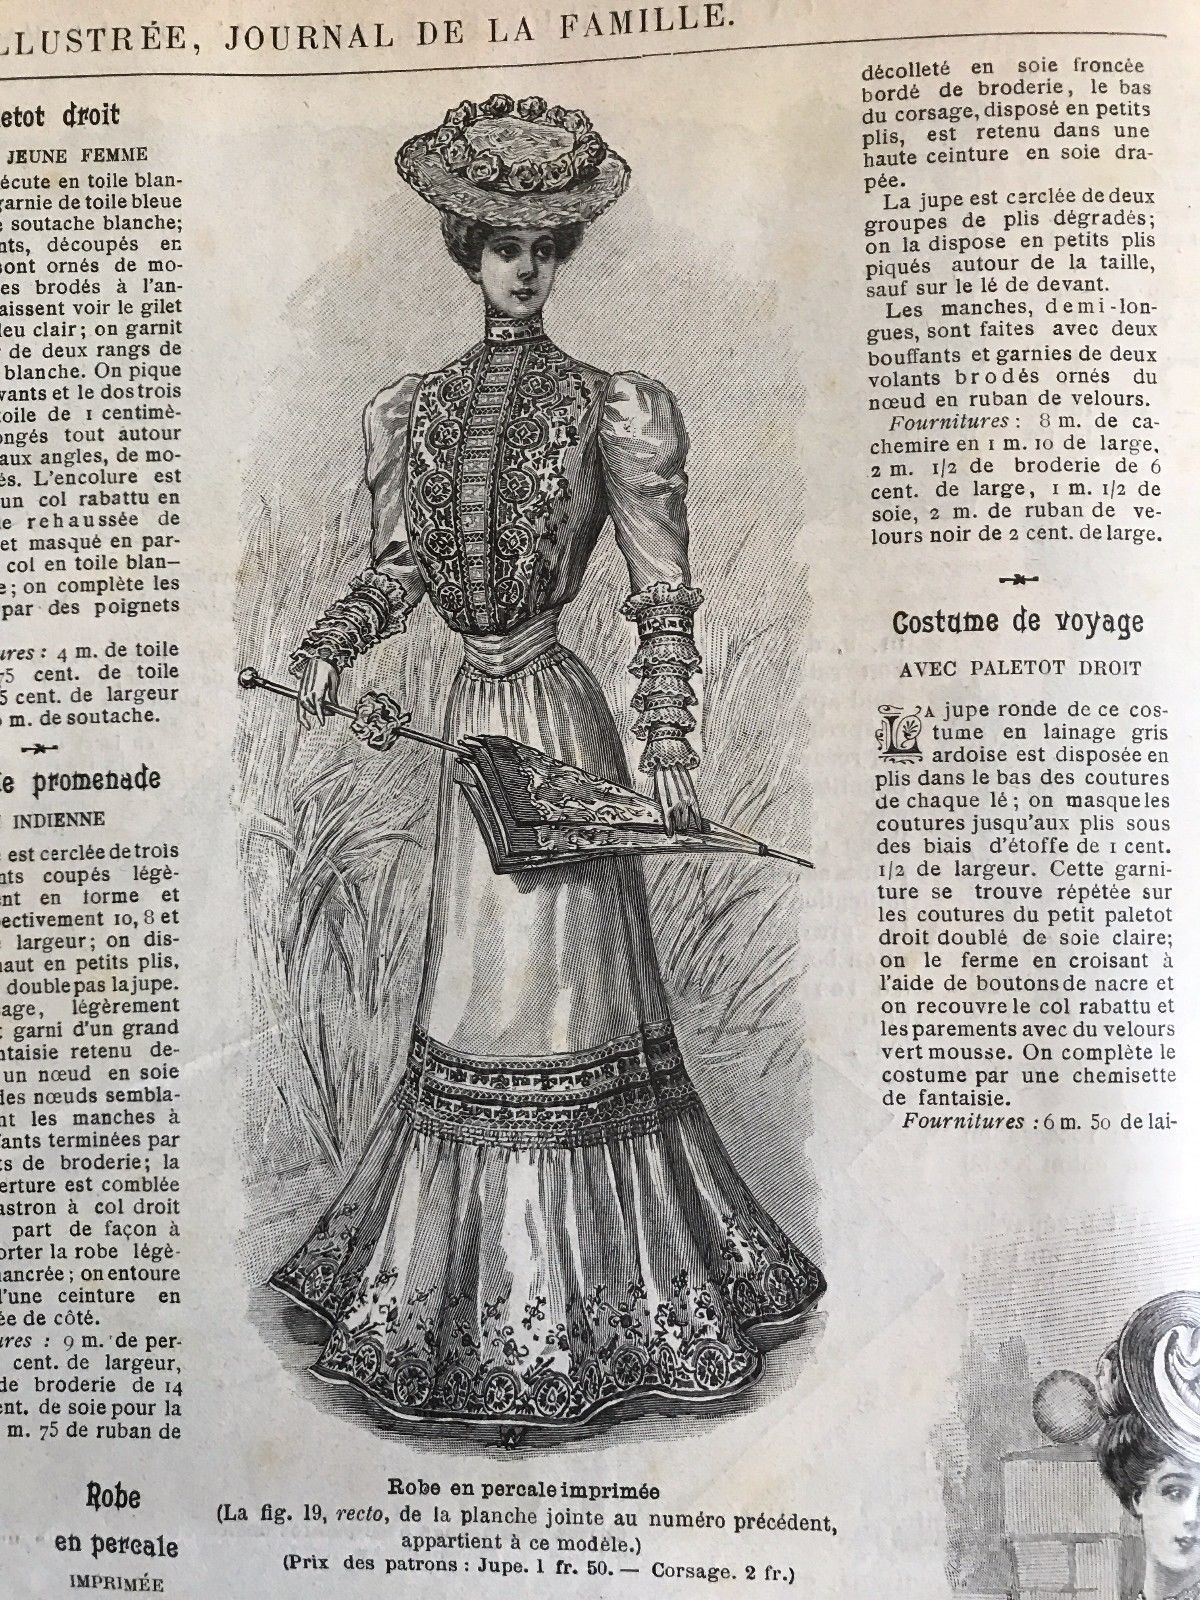 French MODE ILLUSTREE SEWING PATTERN July 17,1898 CORSET ROBE AVEC CORSAGE